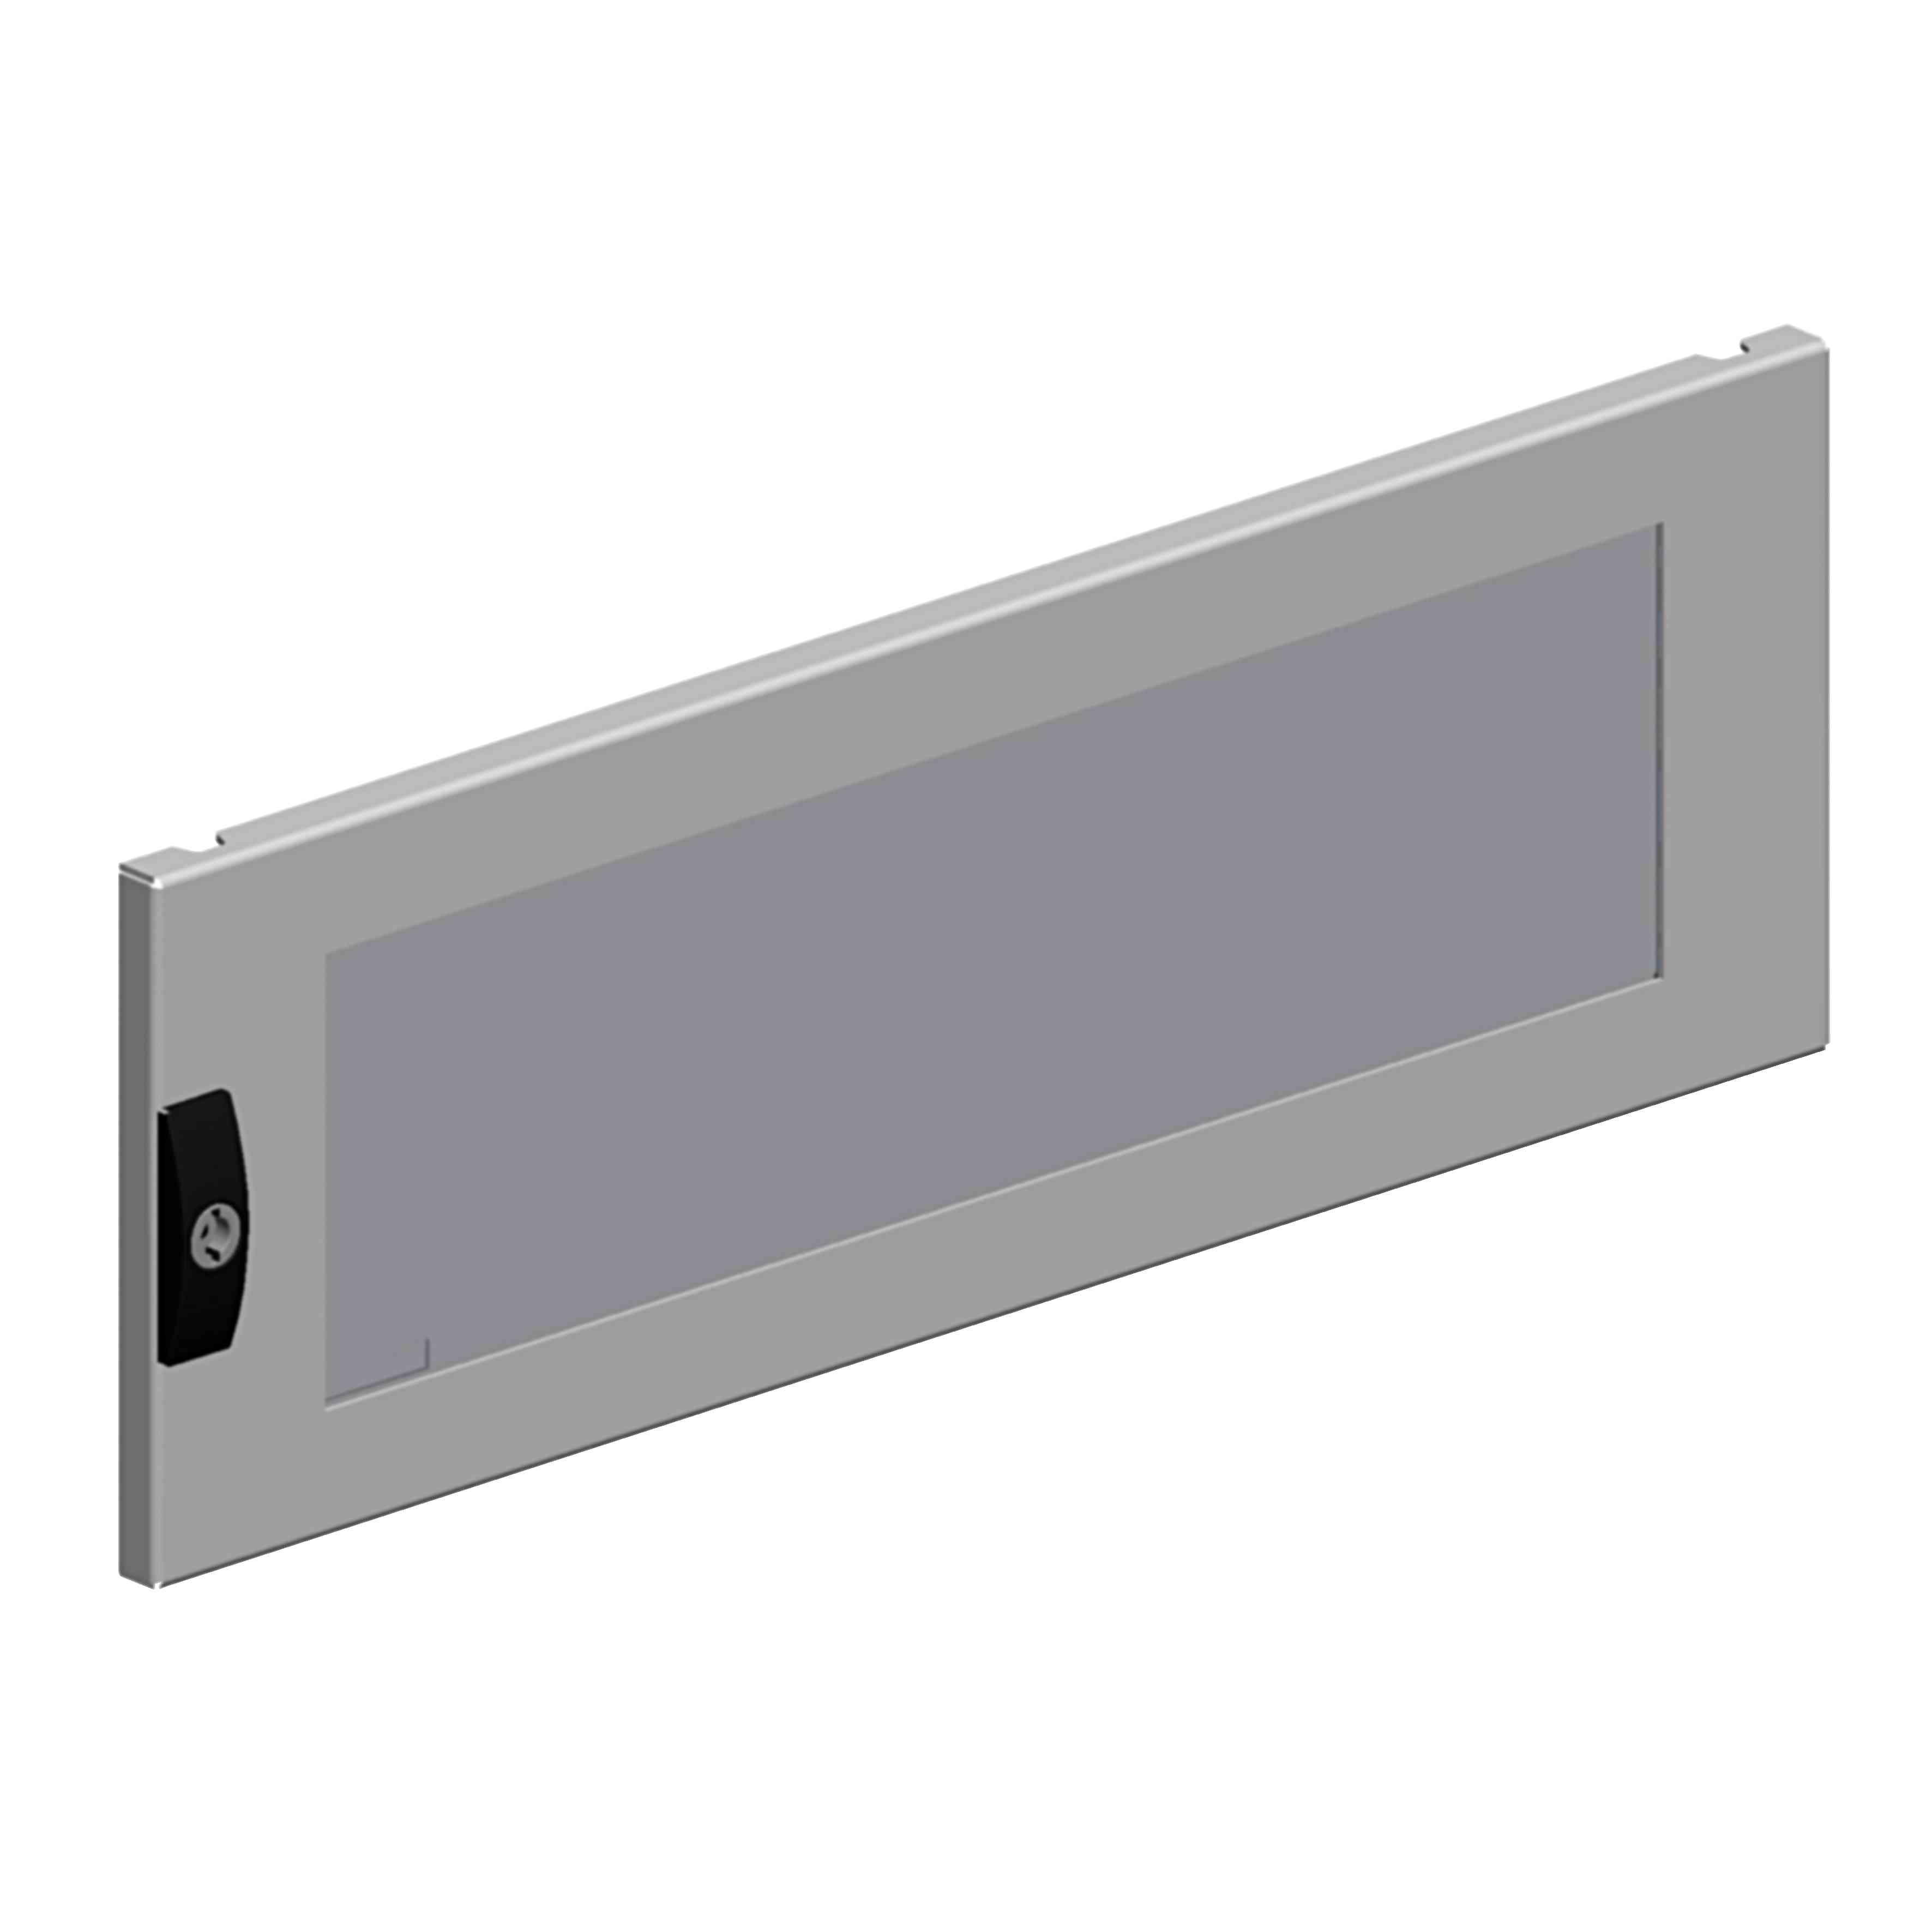 Spacial SF prosojna vrata - 800 x 800 mm